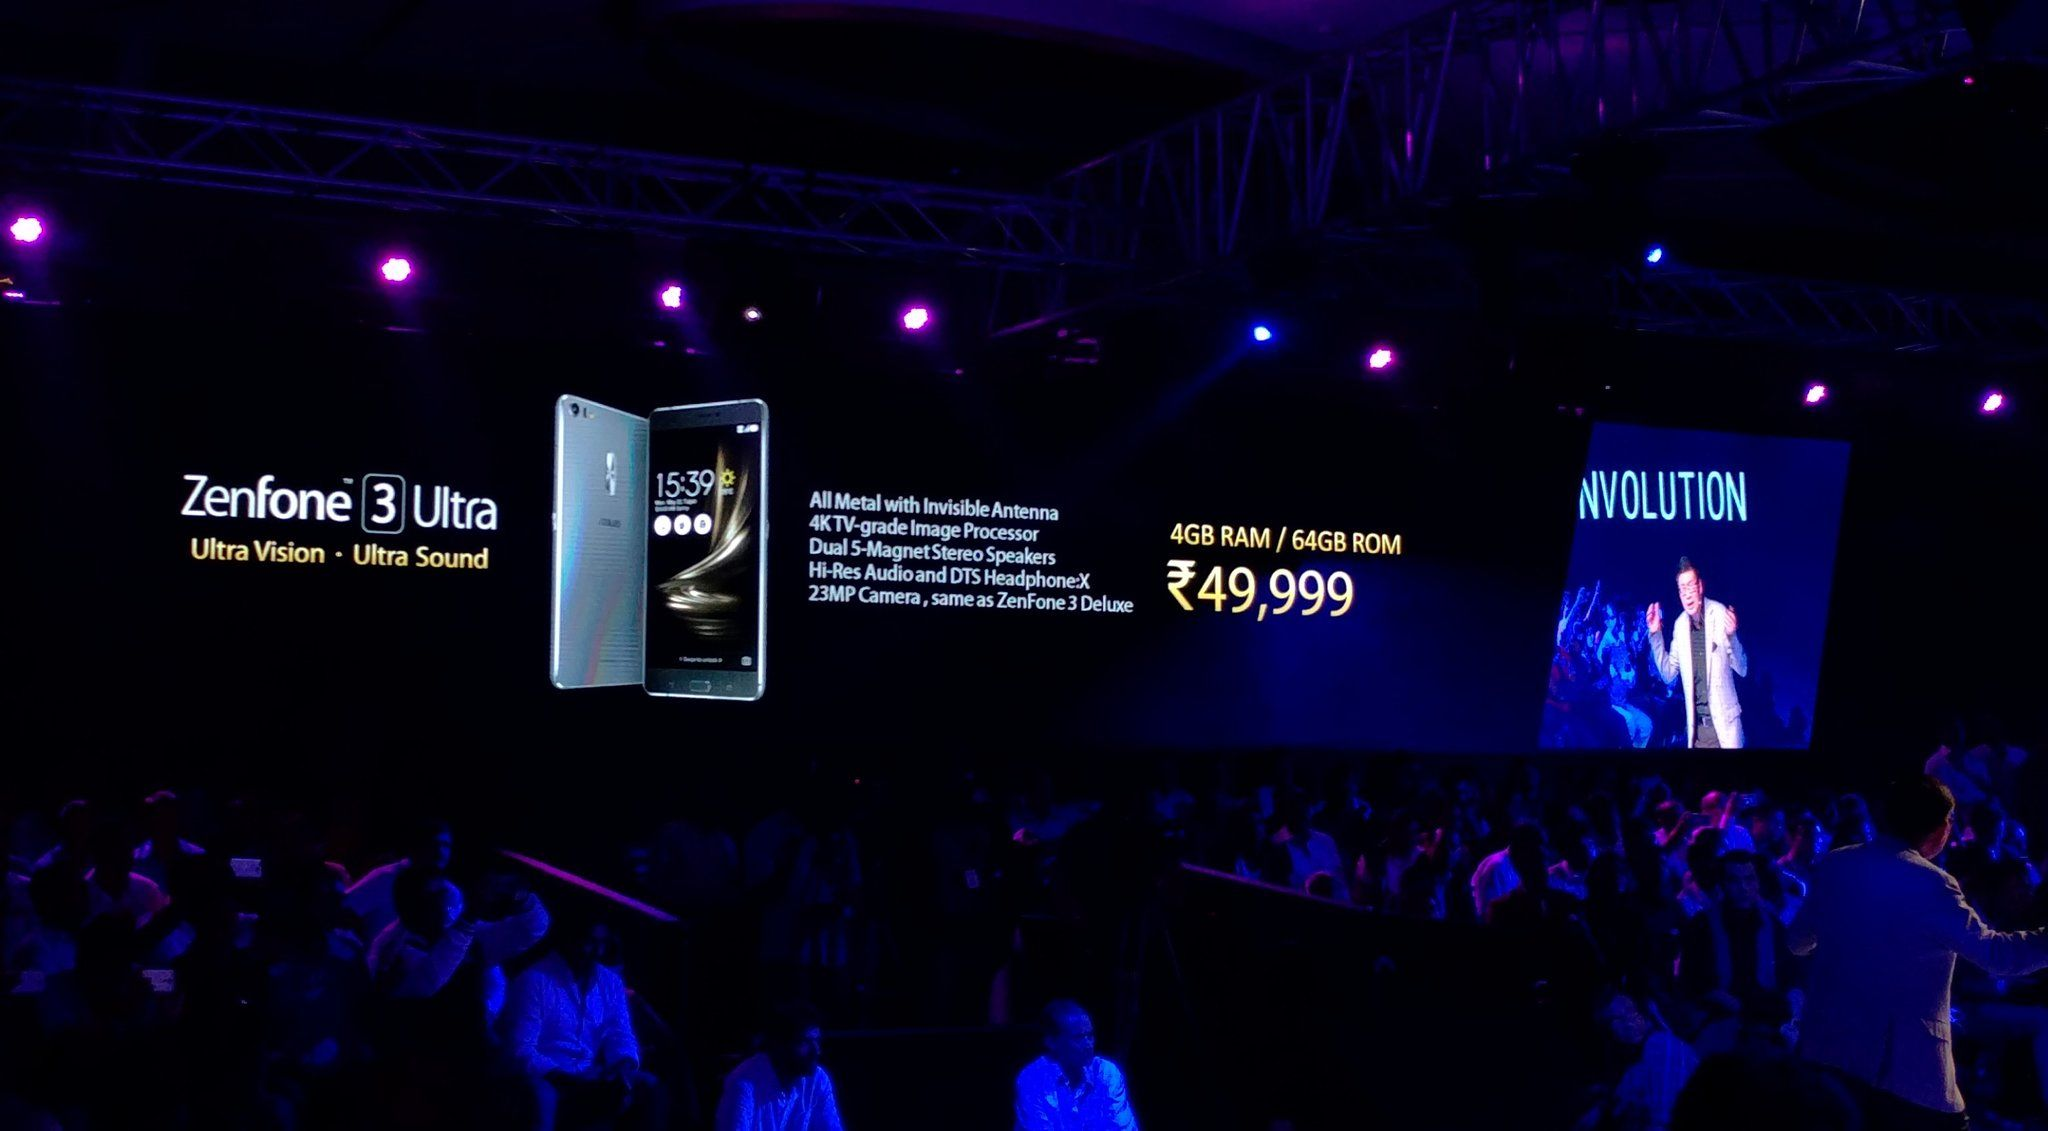 #app #mobile #ZenFone3Ultra: 6.8 inch full HD IPS display SD 652 4GB RAM 23MP camera. Price Rs 49999 http://pic.twitter.com/IdrcG6rPF6   App Mobile 4u (@M0bileappDev) August 17 2016